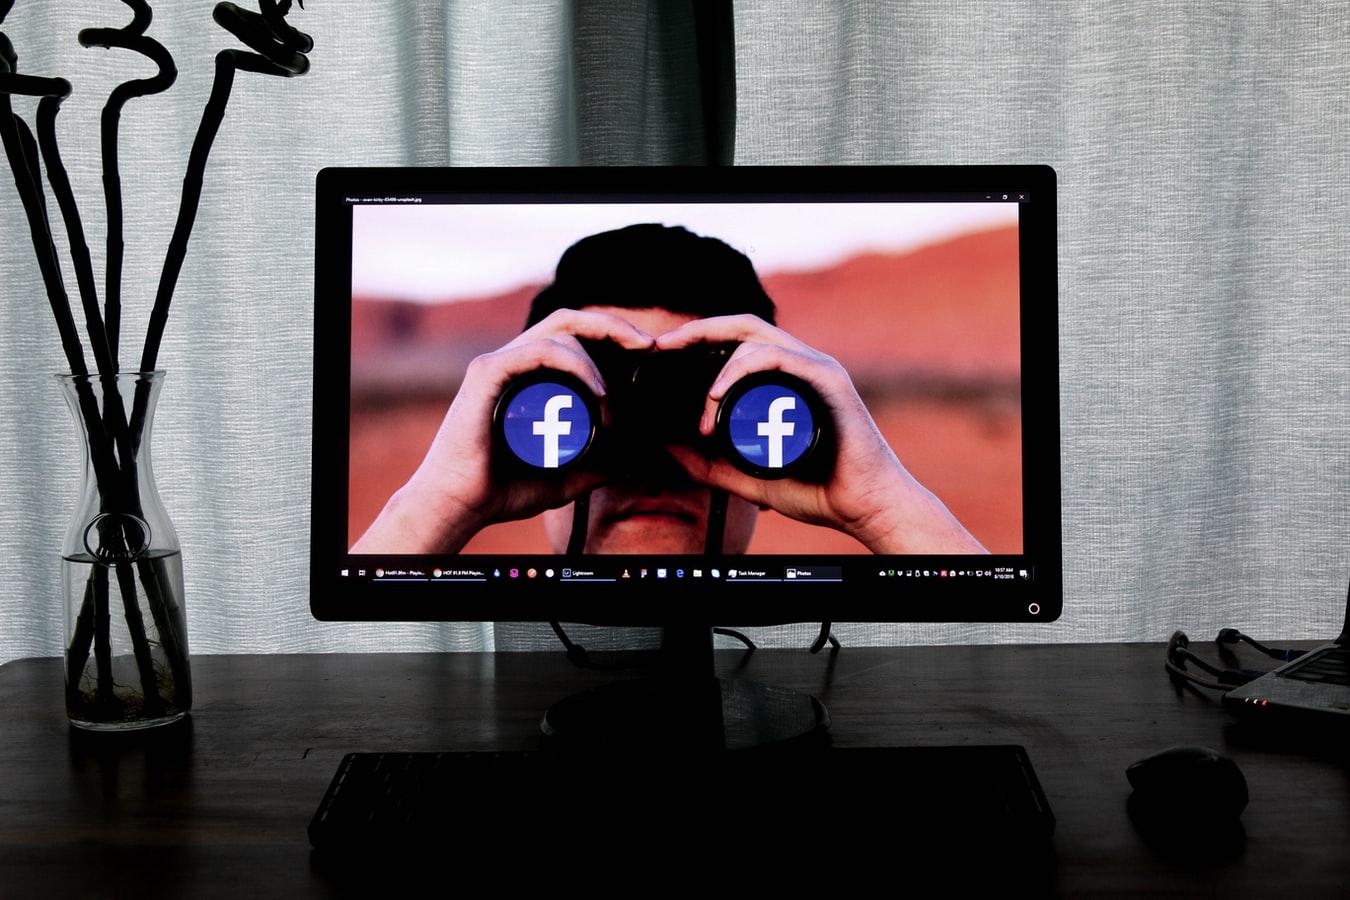 Oι 6 πιο κοινές απάτες στο Facebook Marketplace και πώς να τις αποφύγετε